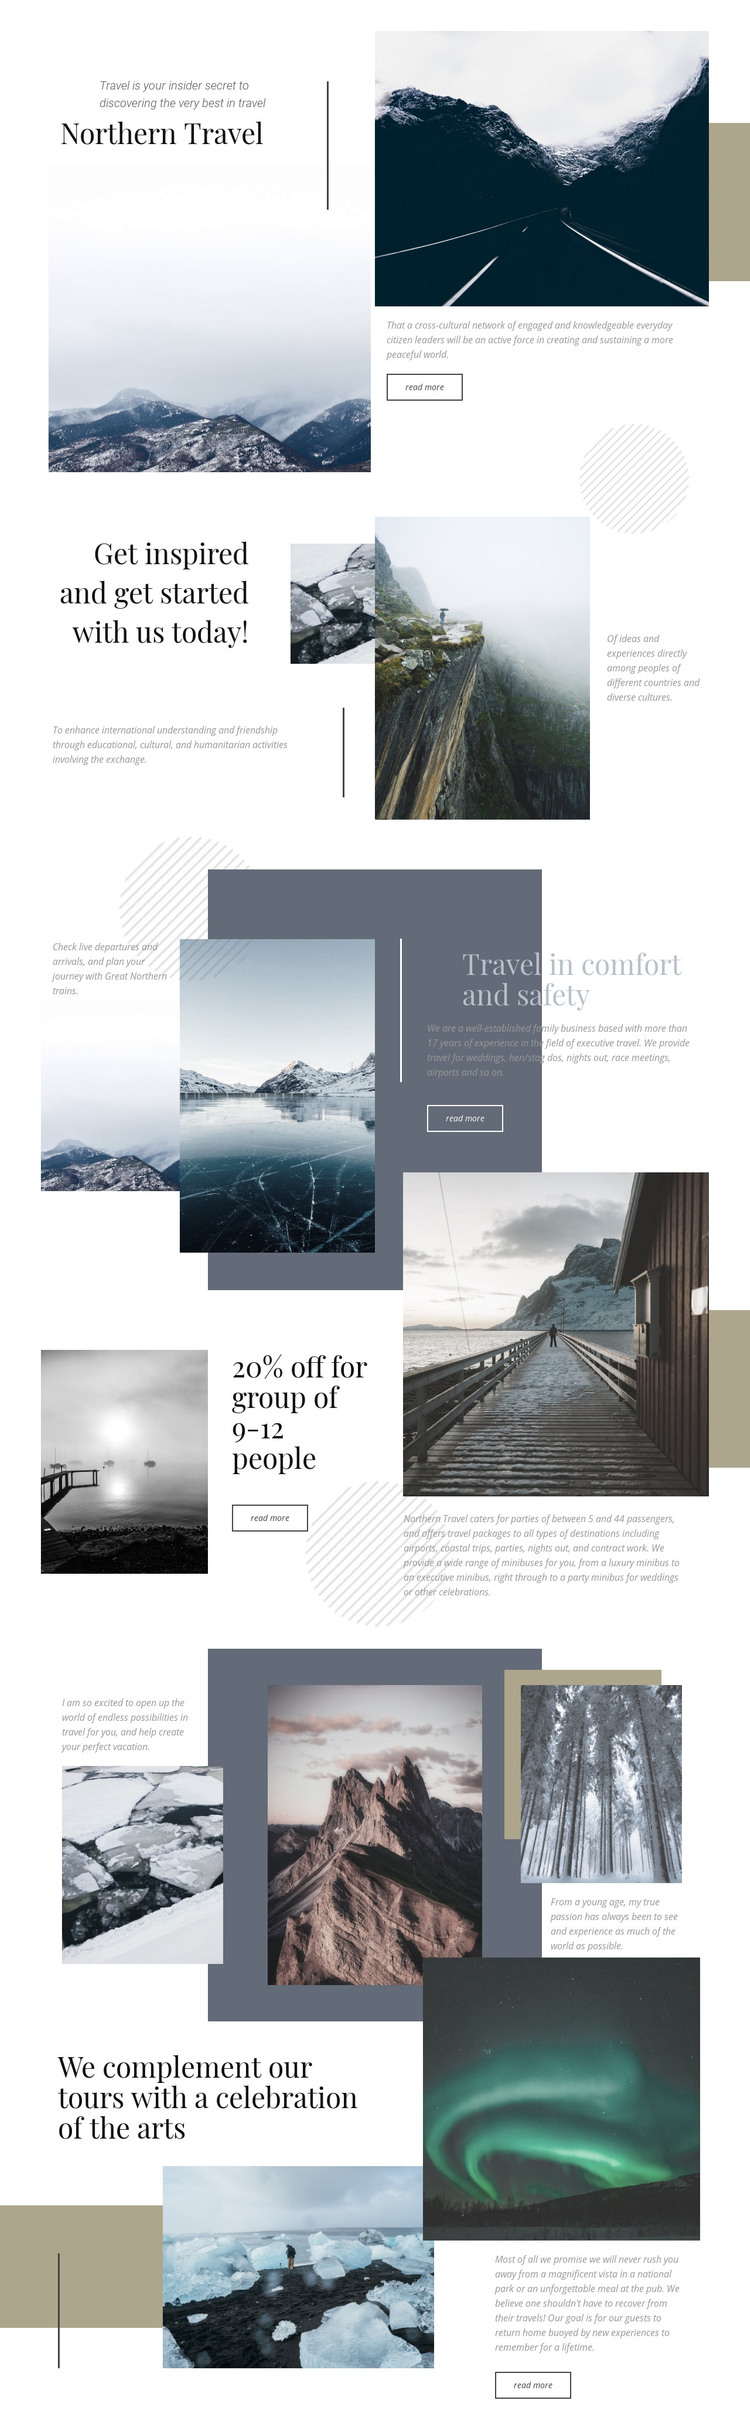 Northern Travel Homepage Design